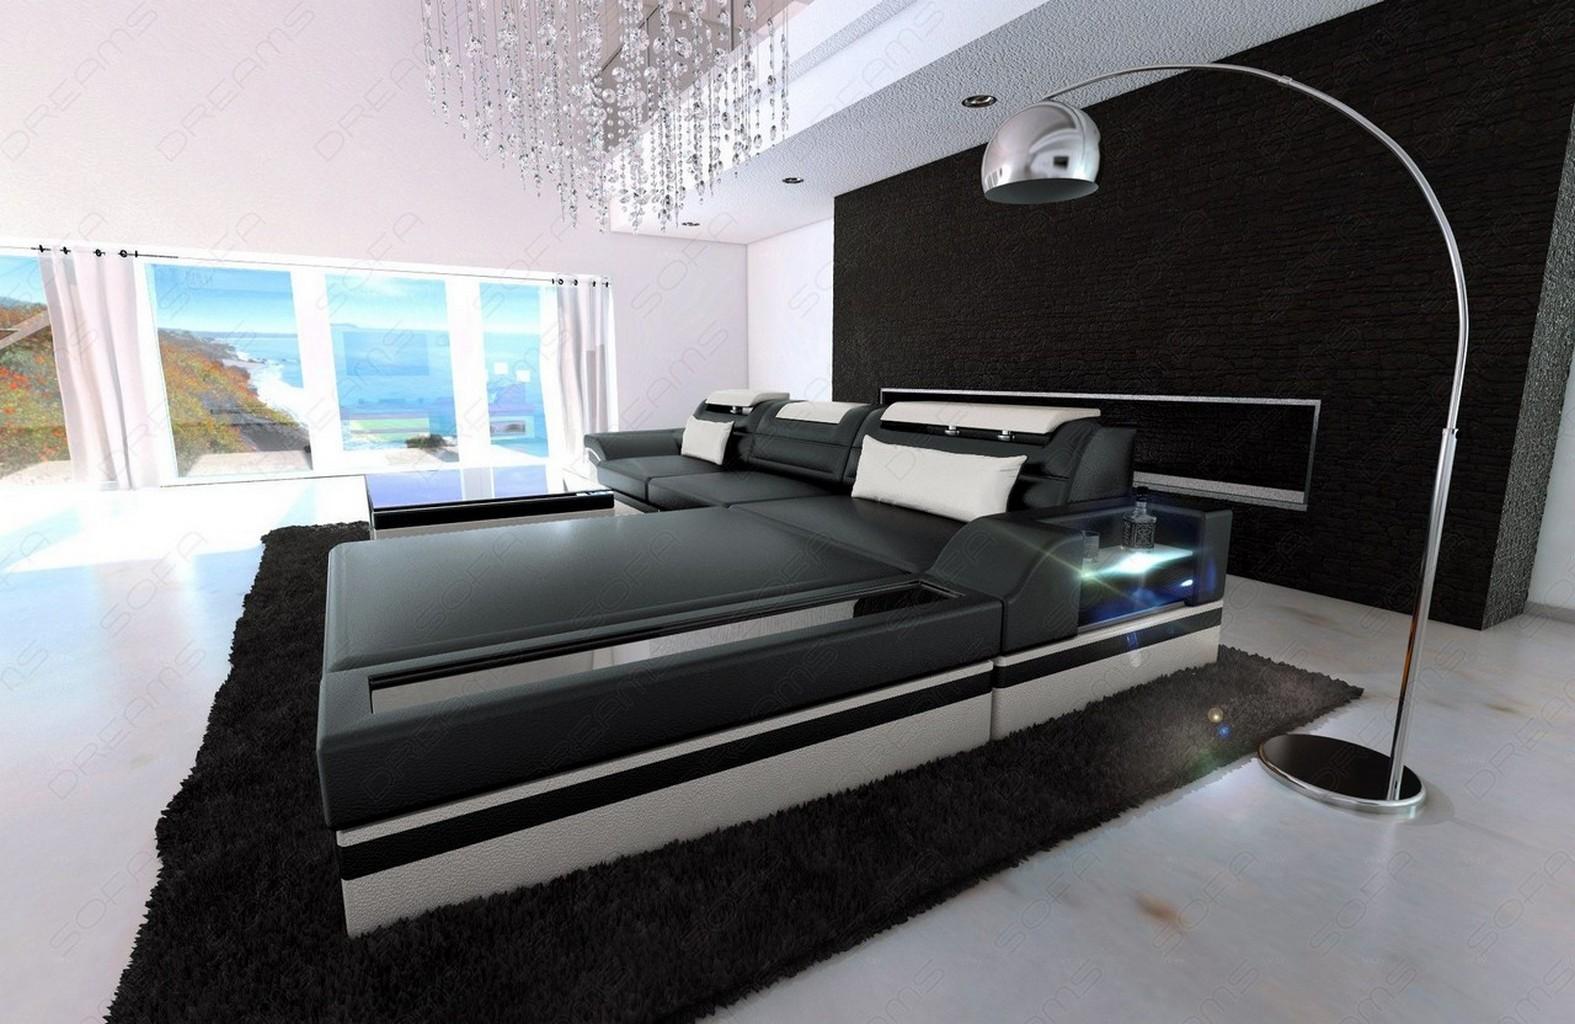 Ledersofa designcouch parma l form couch schwarz weiss for Sofa schwarz